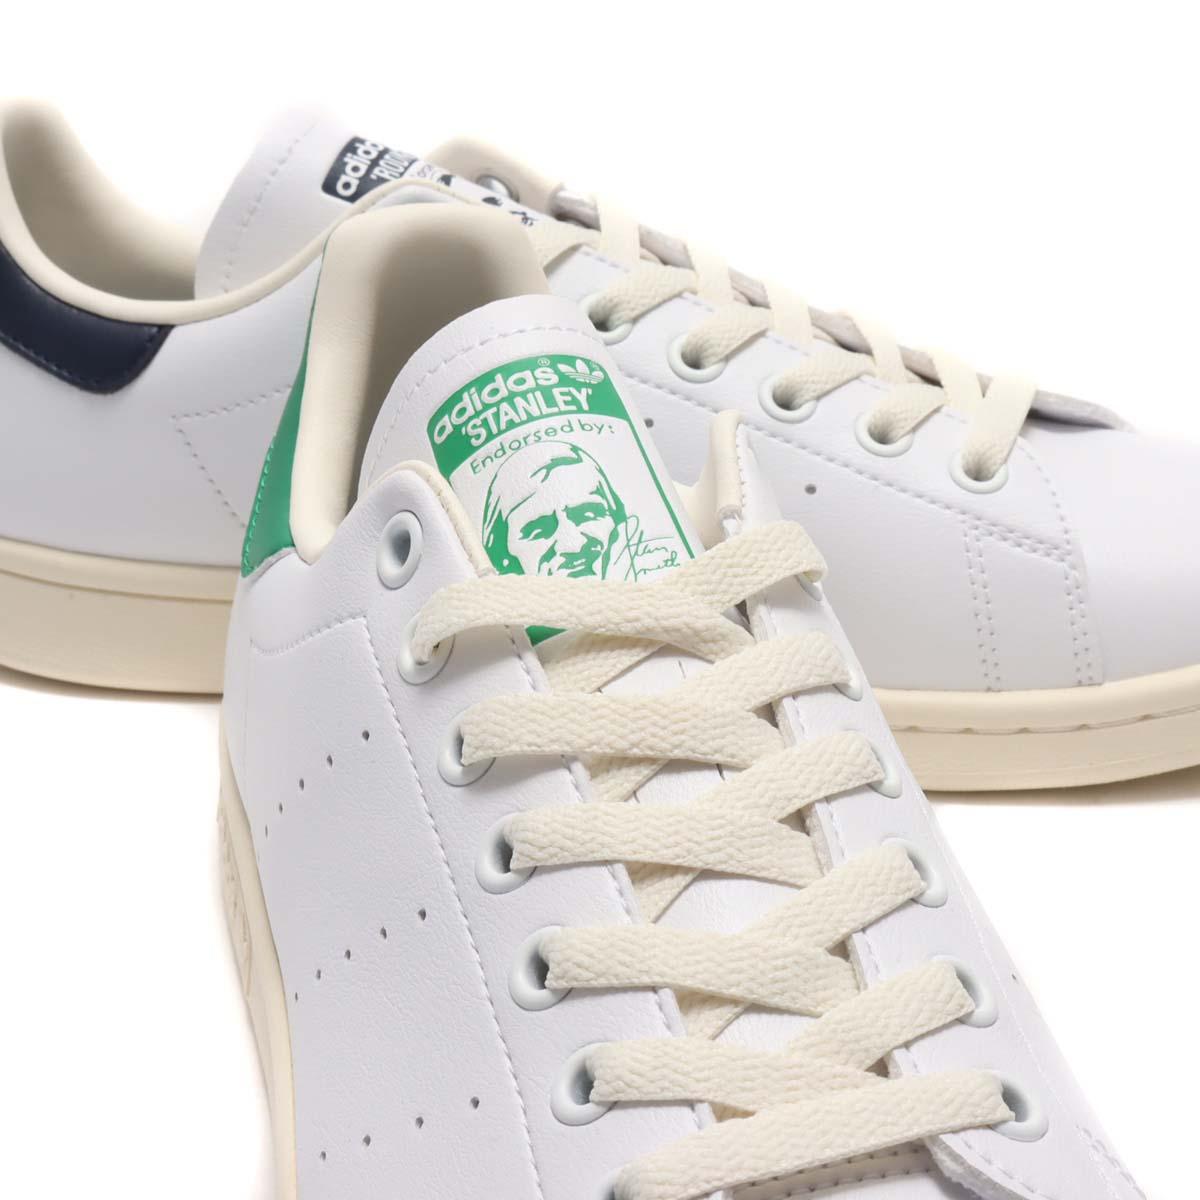 adidas STAN SMITH x Rod Laver CREAM WHITE / FOOTWEAR WHITE / COLLEGE NAVY FY1794 アディダス スタンスミス x ロッド・レーバー ホワイト/グリーン/ネイビー